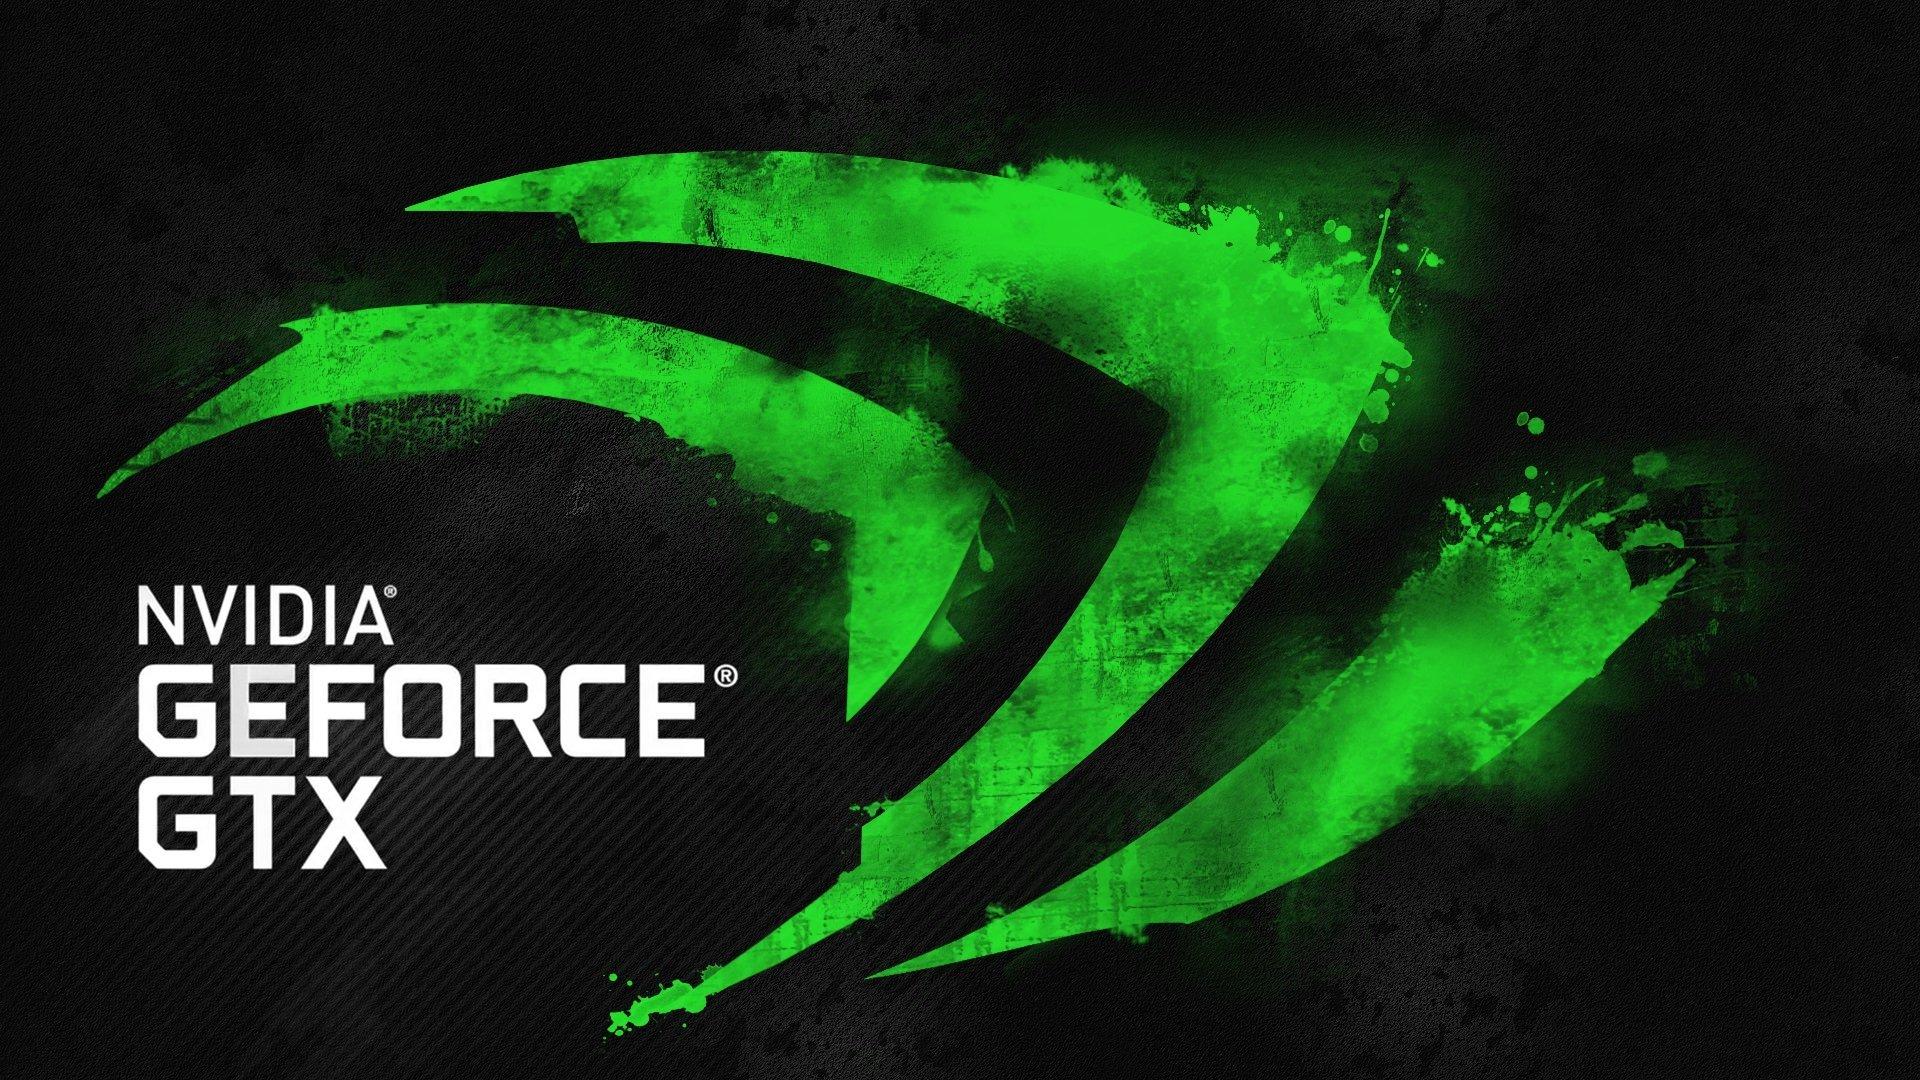 Nvidia GeForce 416.94